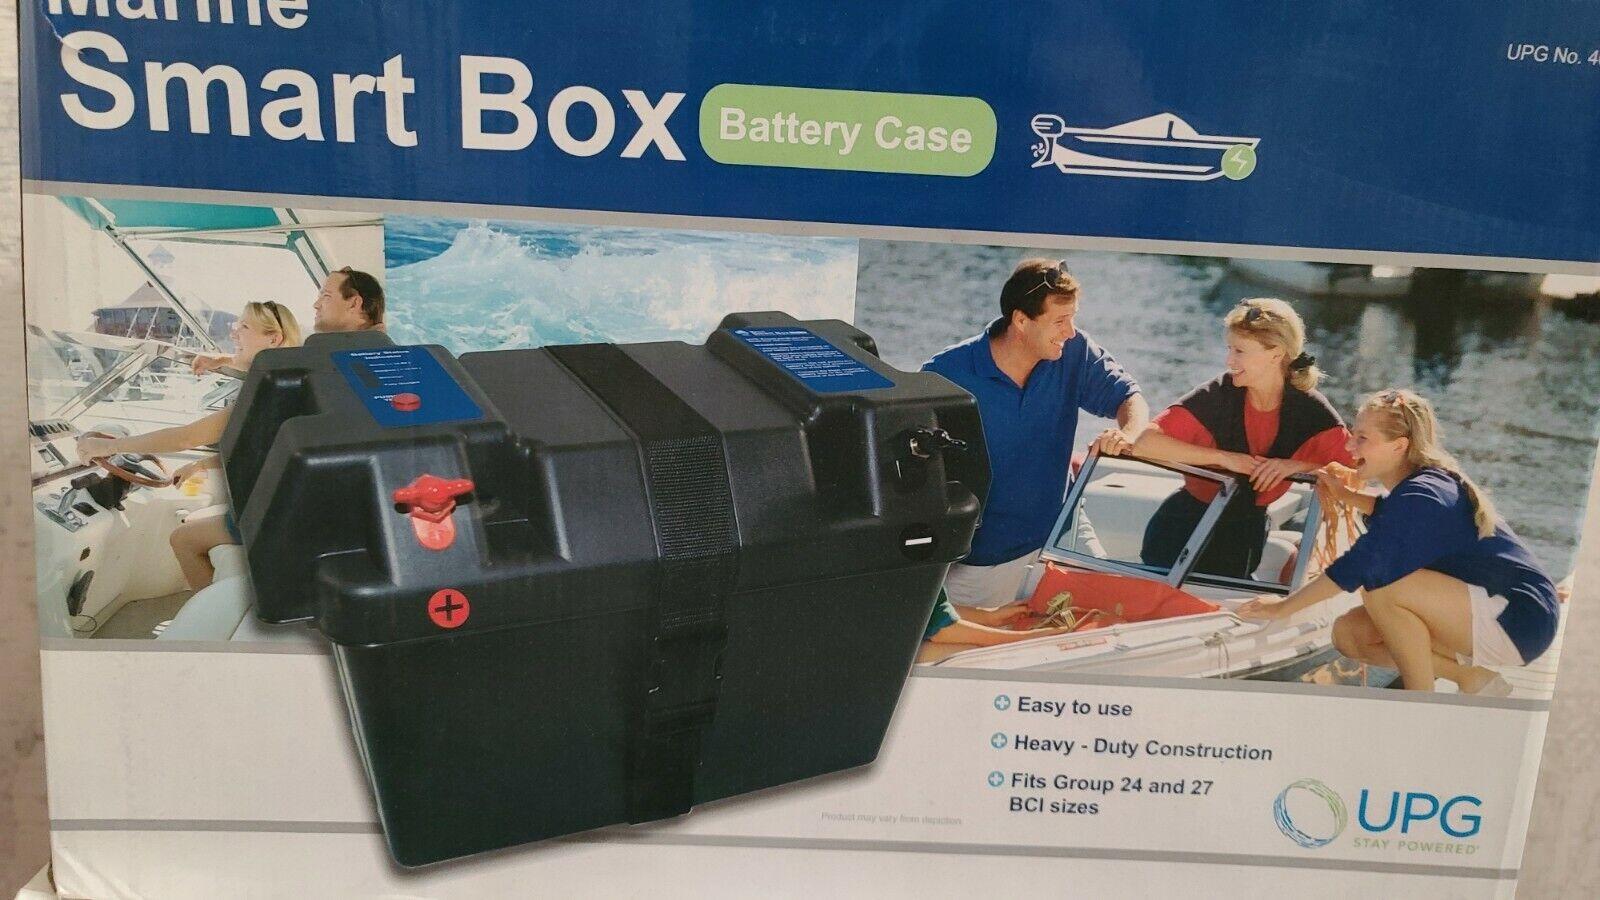 UPG Marine Smart Box Battery Case